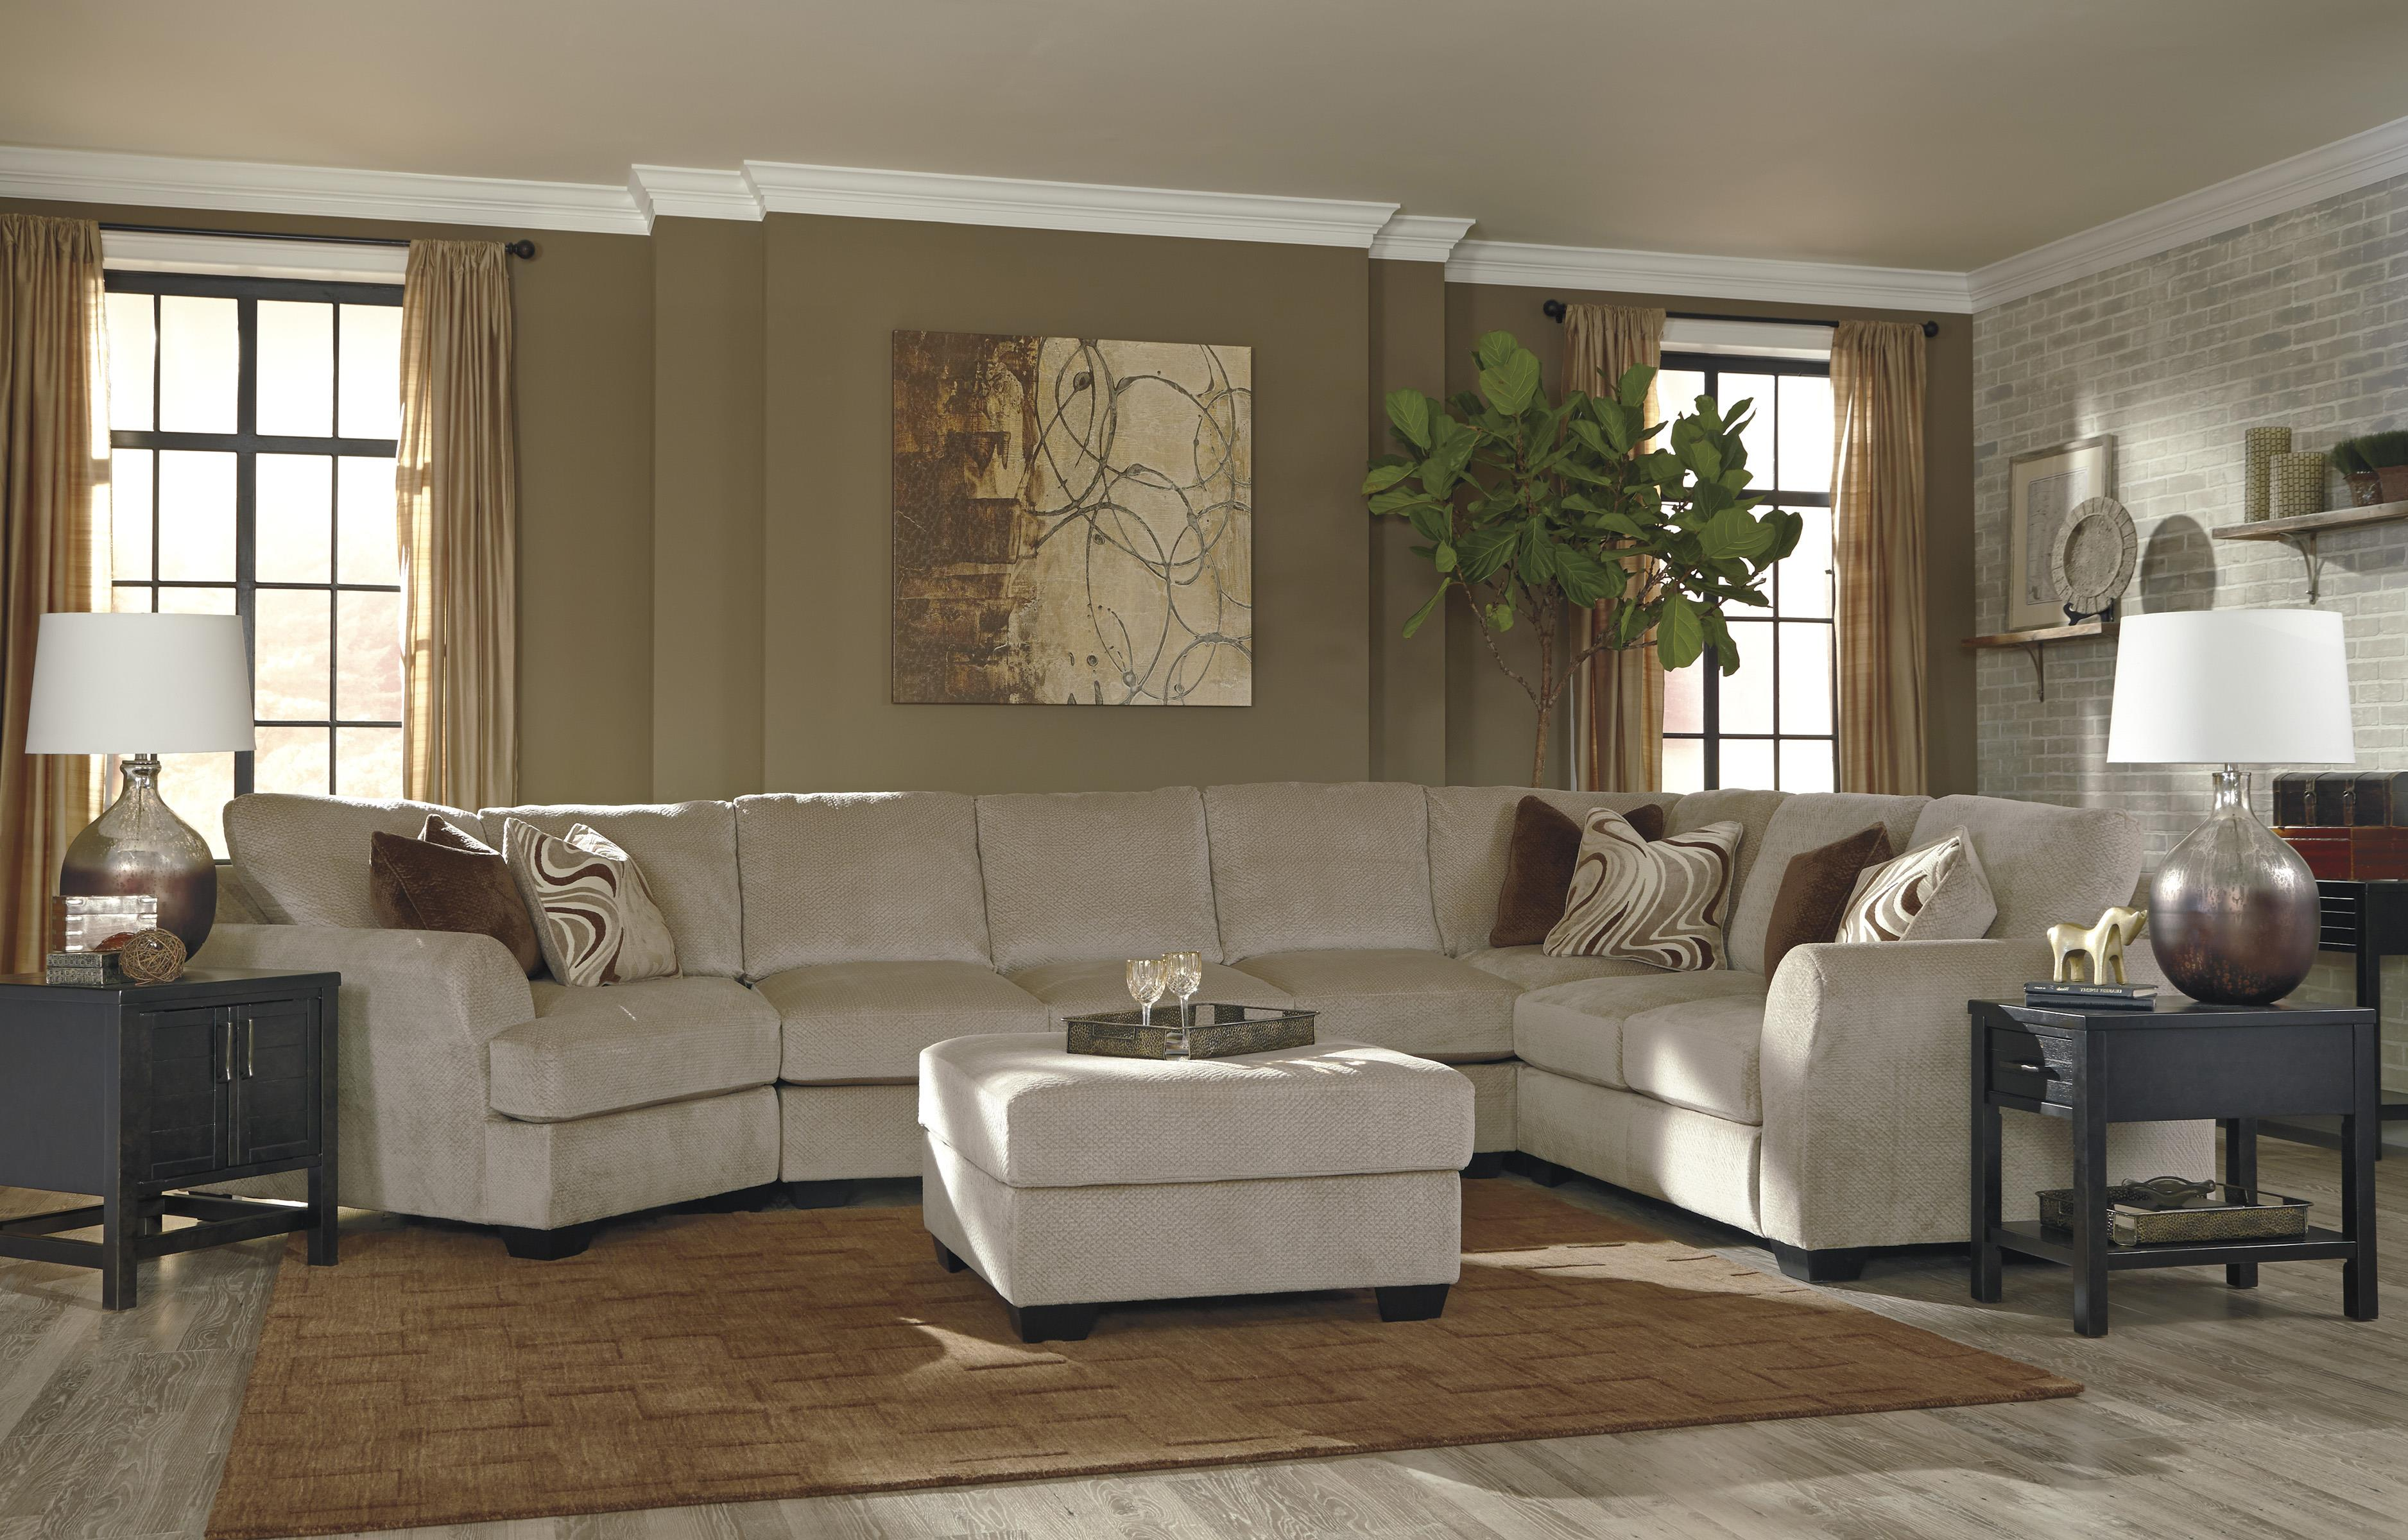 Ashley/Benchcraft Hazes Stationary Living Room Group - Item Number: 65701 Living Room Group 8